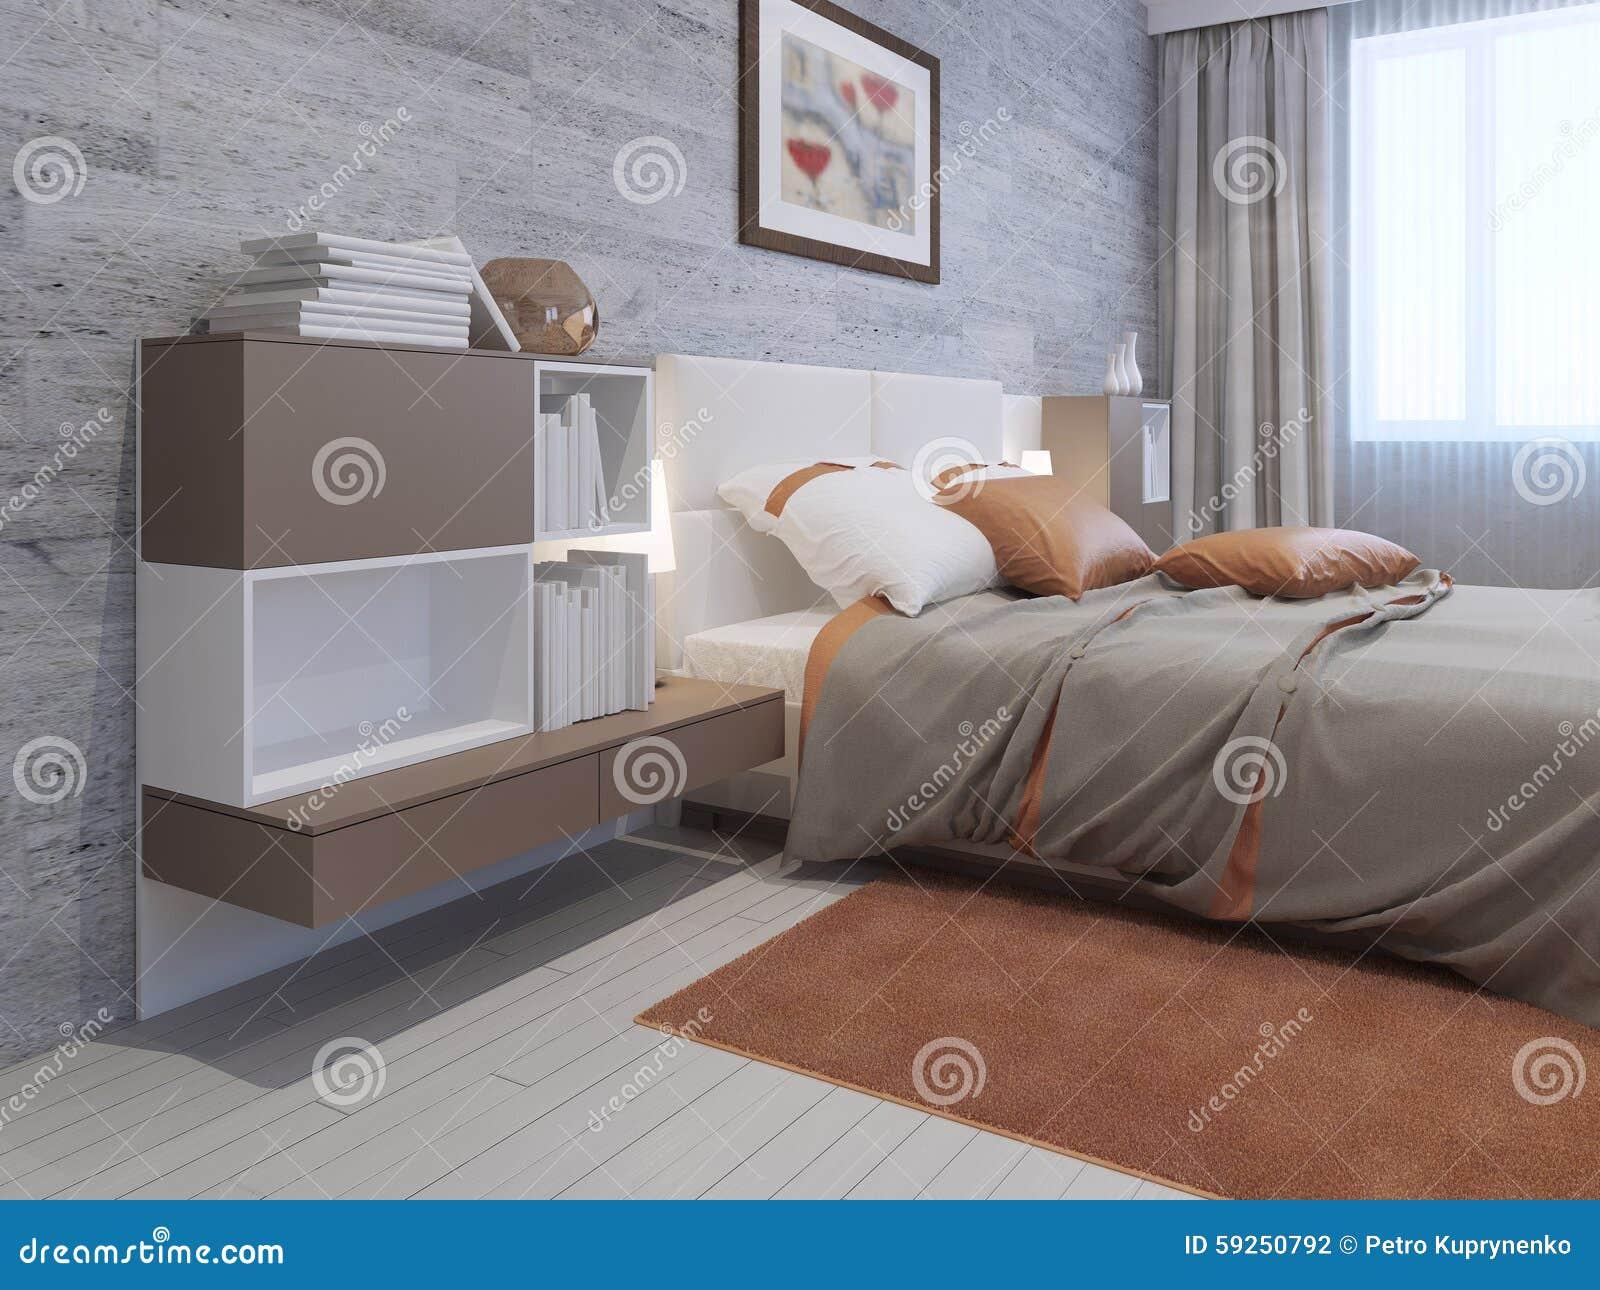 Art Deco Bedroom Furniture Stock Illustration Illustration Of